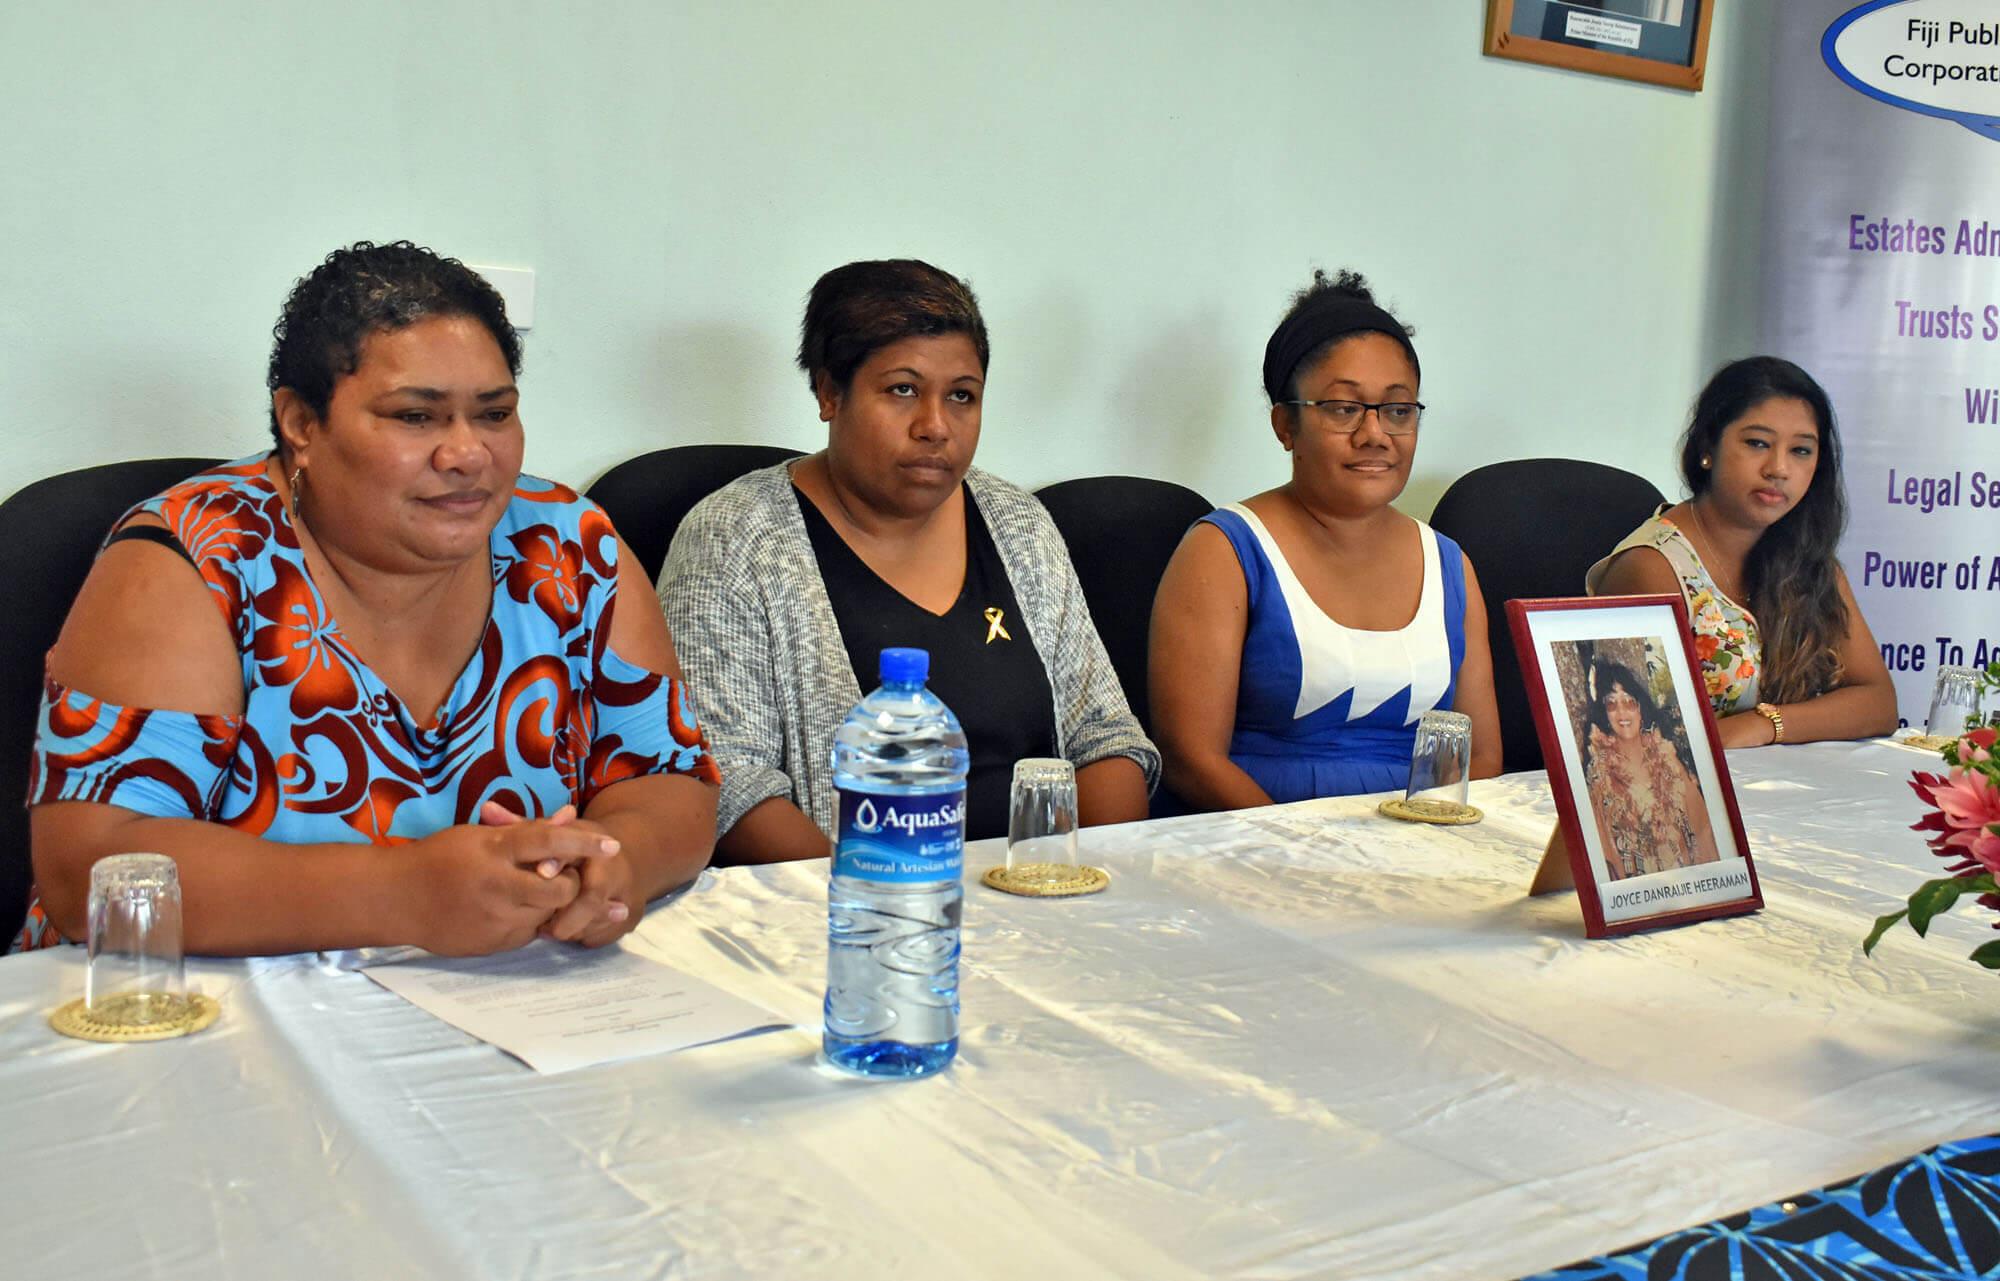 Late cancer victim through FPTCL donates $10k towards WOWS Kids Fiji